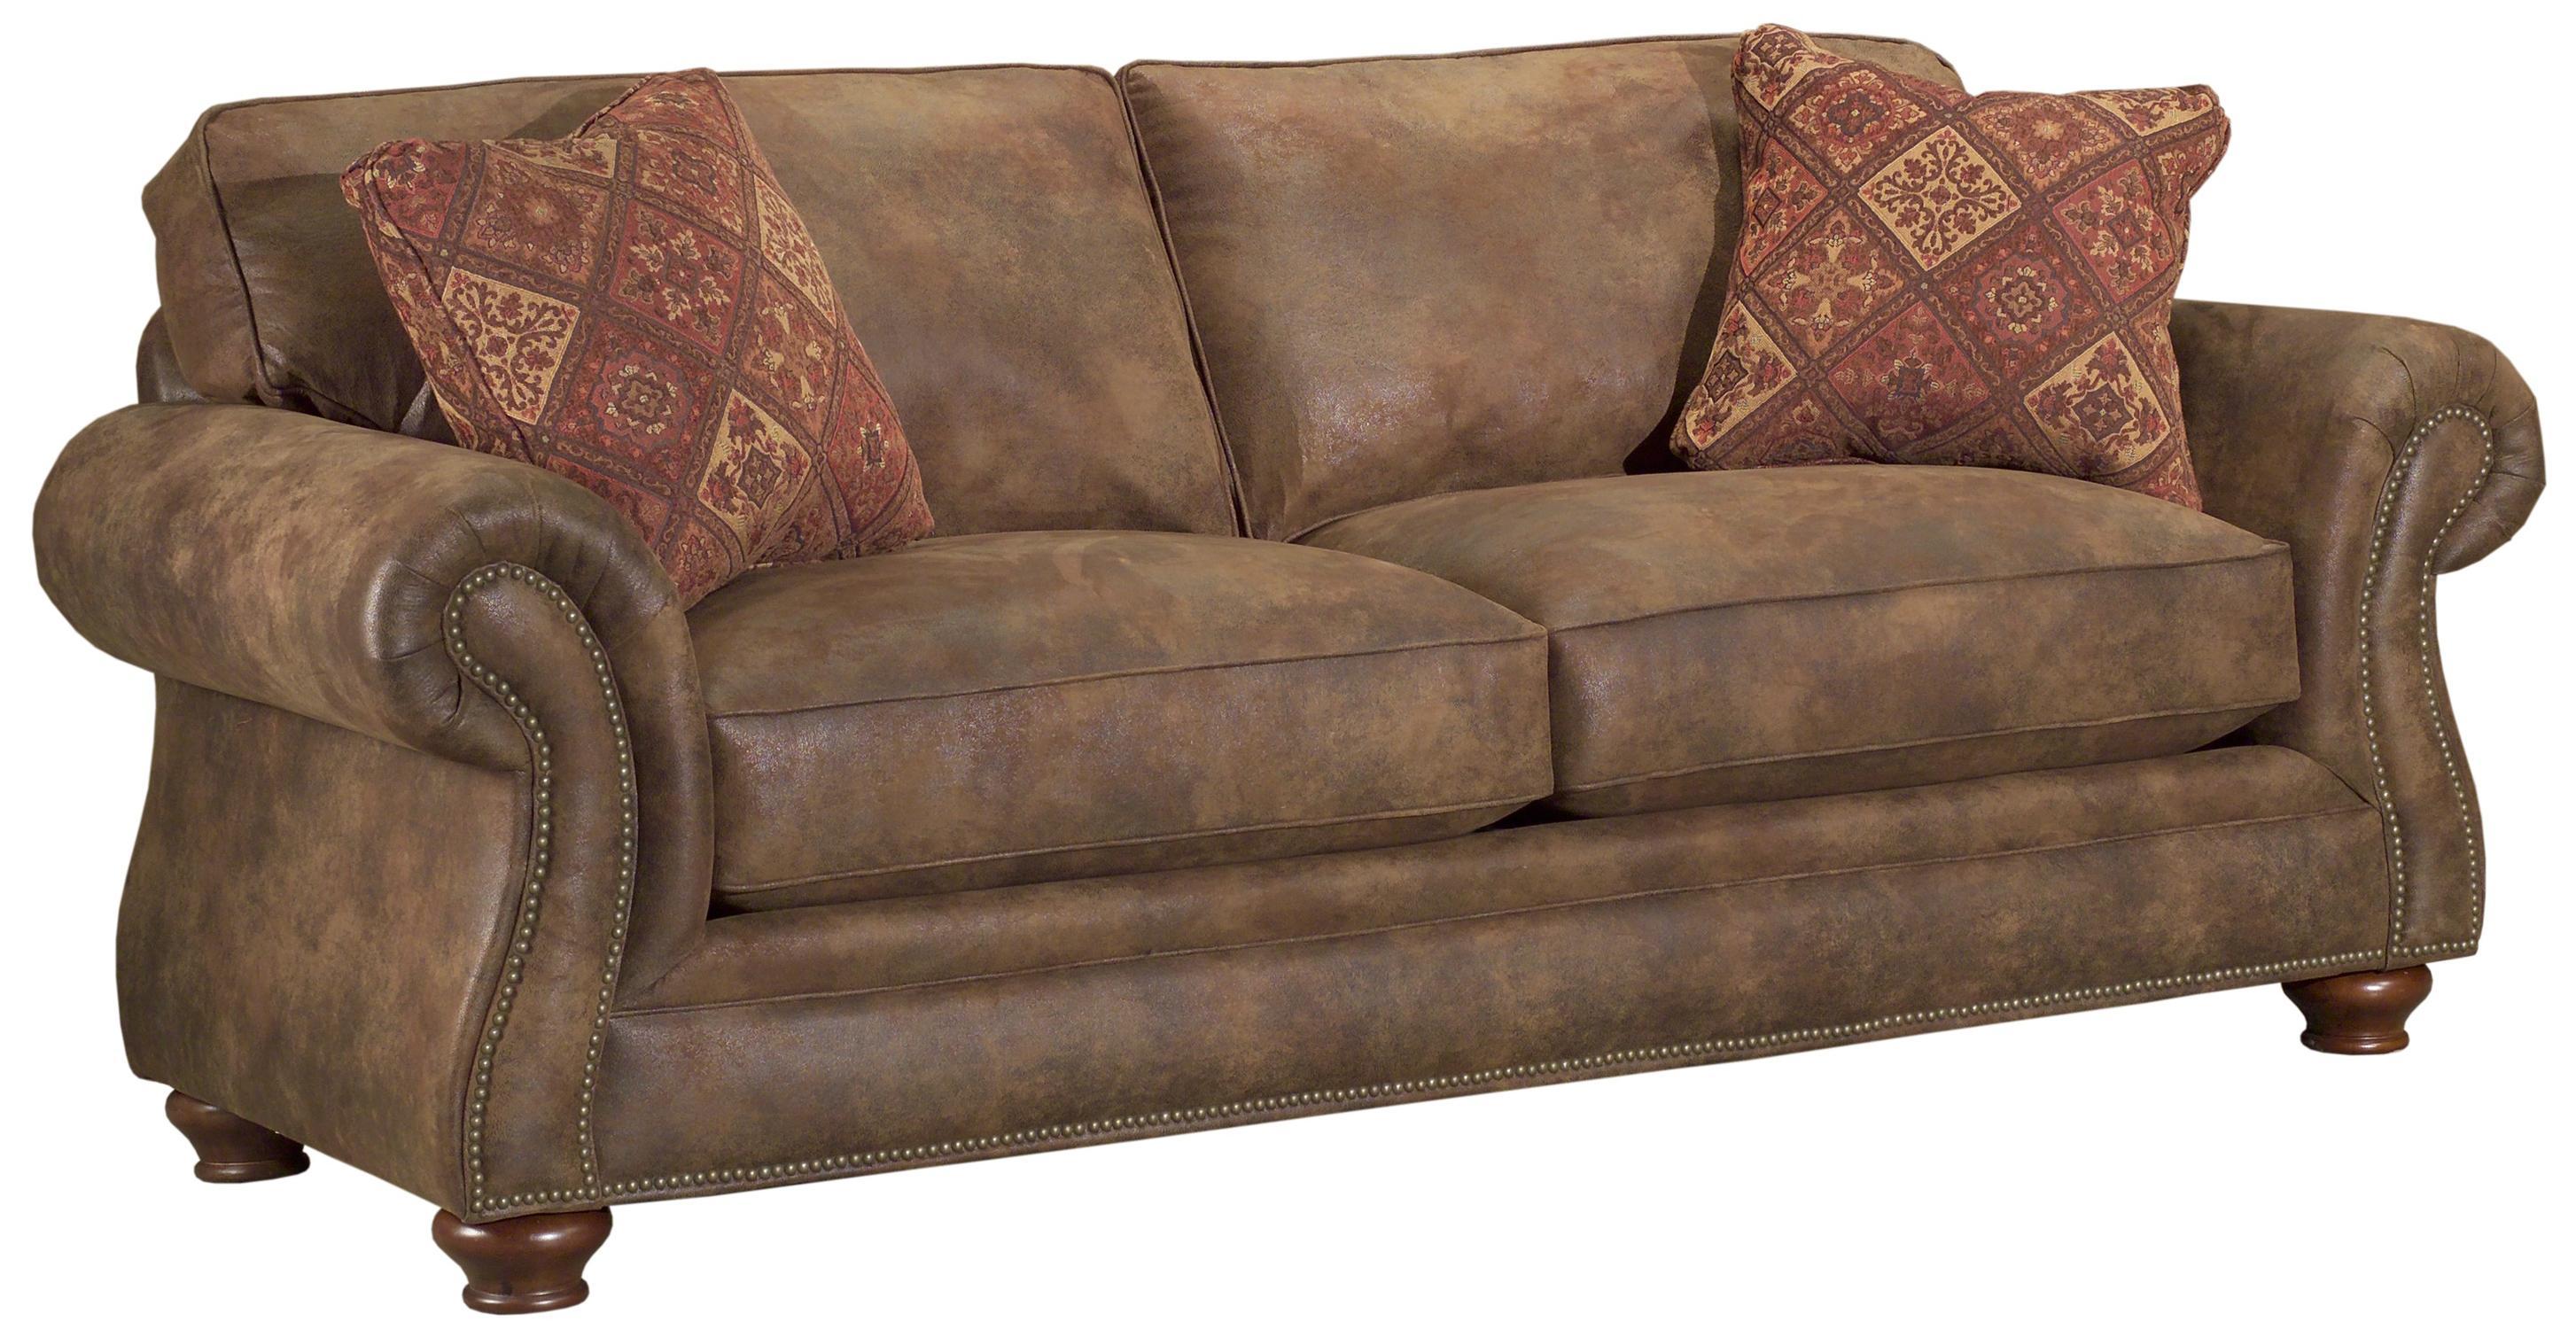 - Broyhill Express Laramie Quick Ship Traditional Sleeper Sofa With